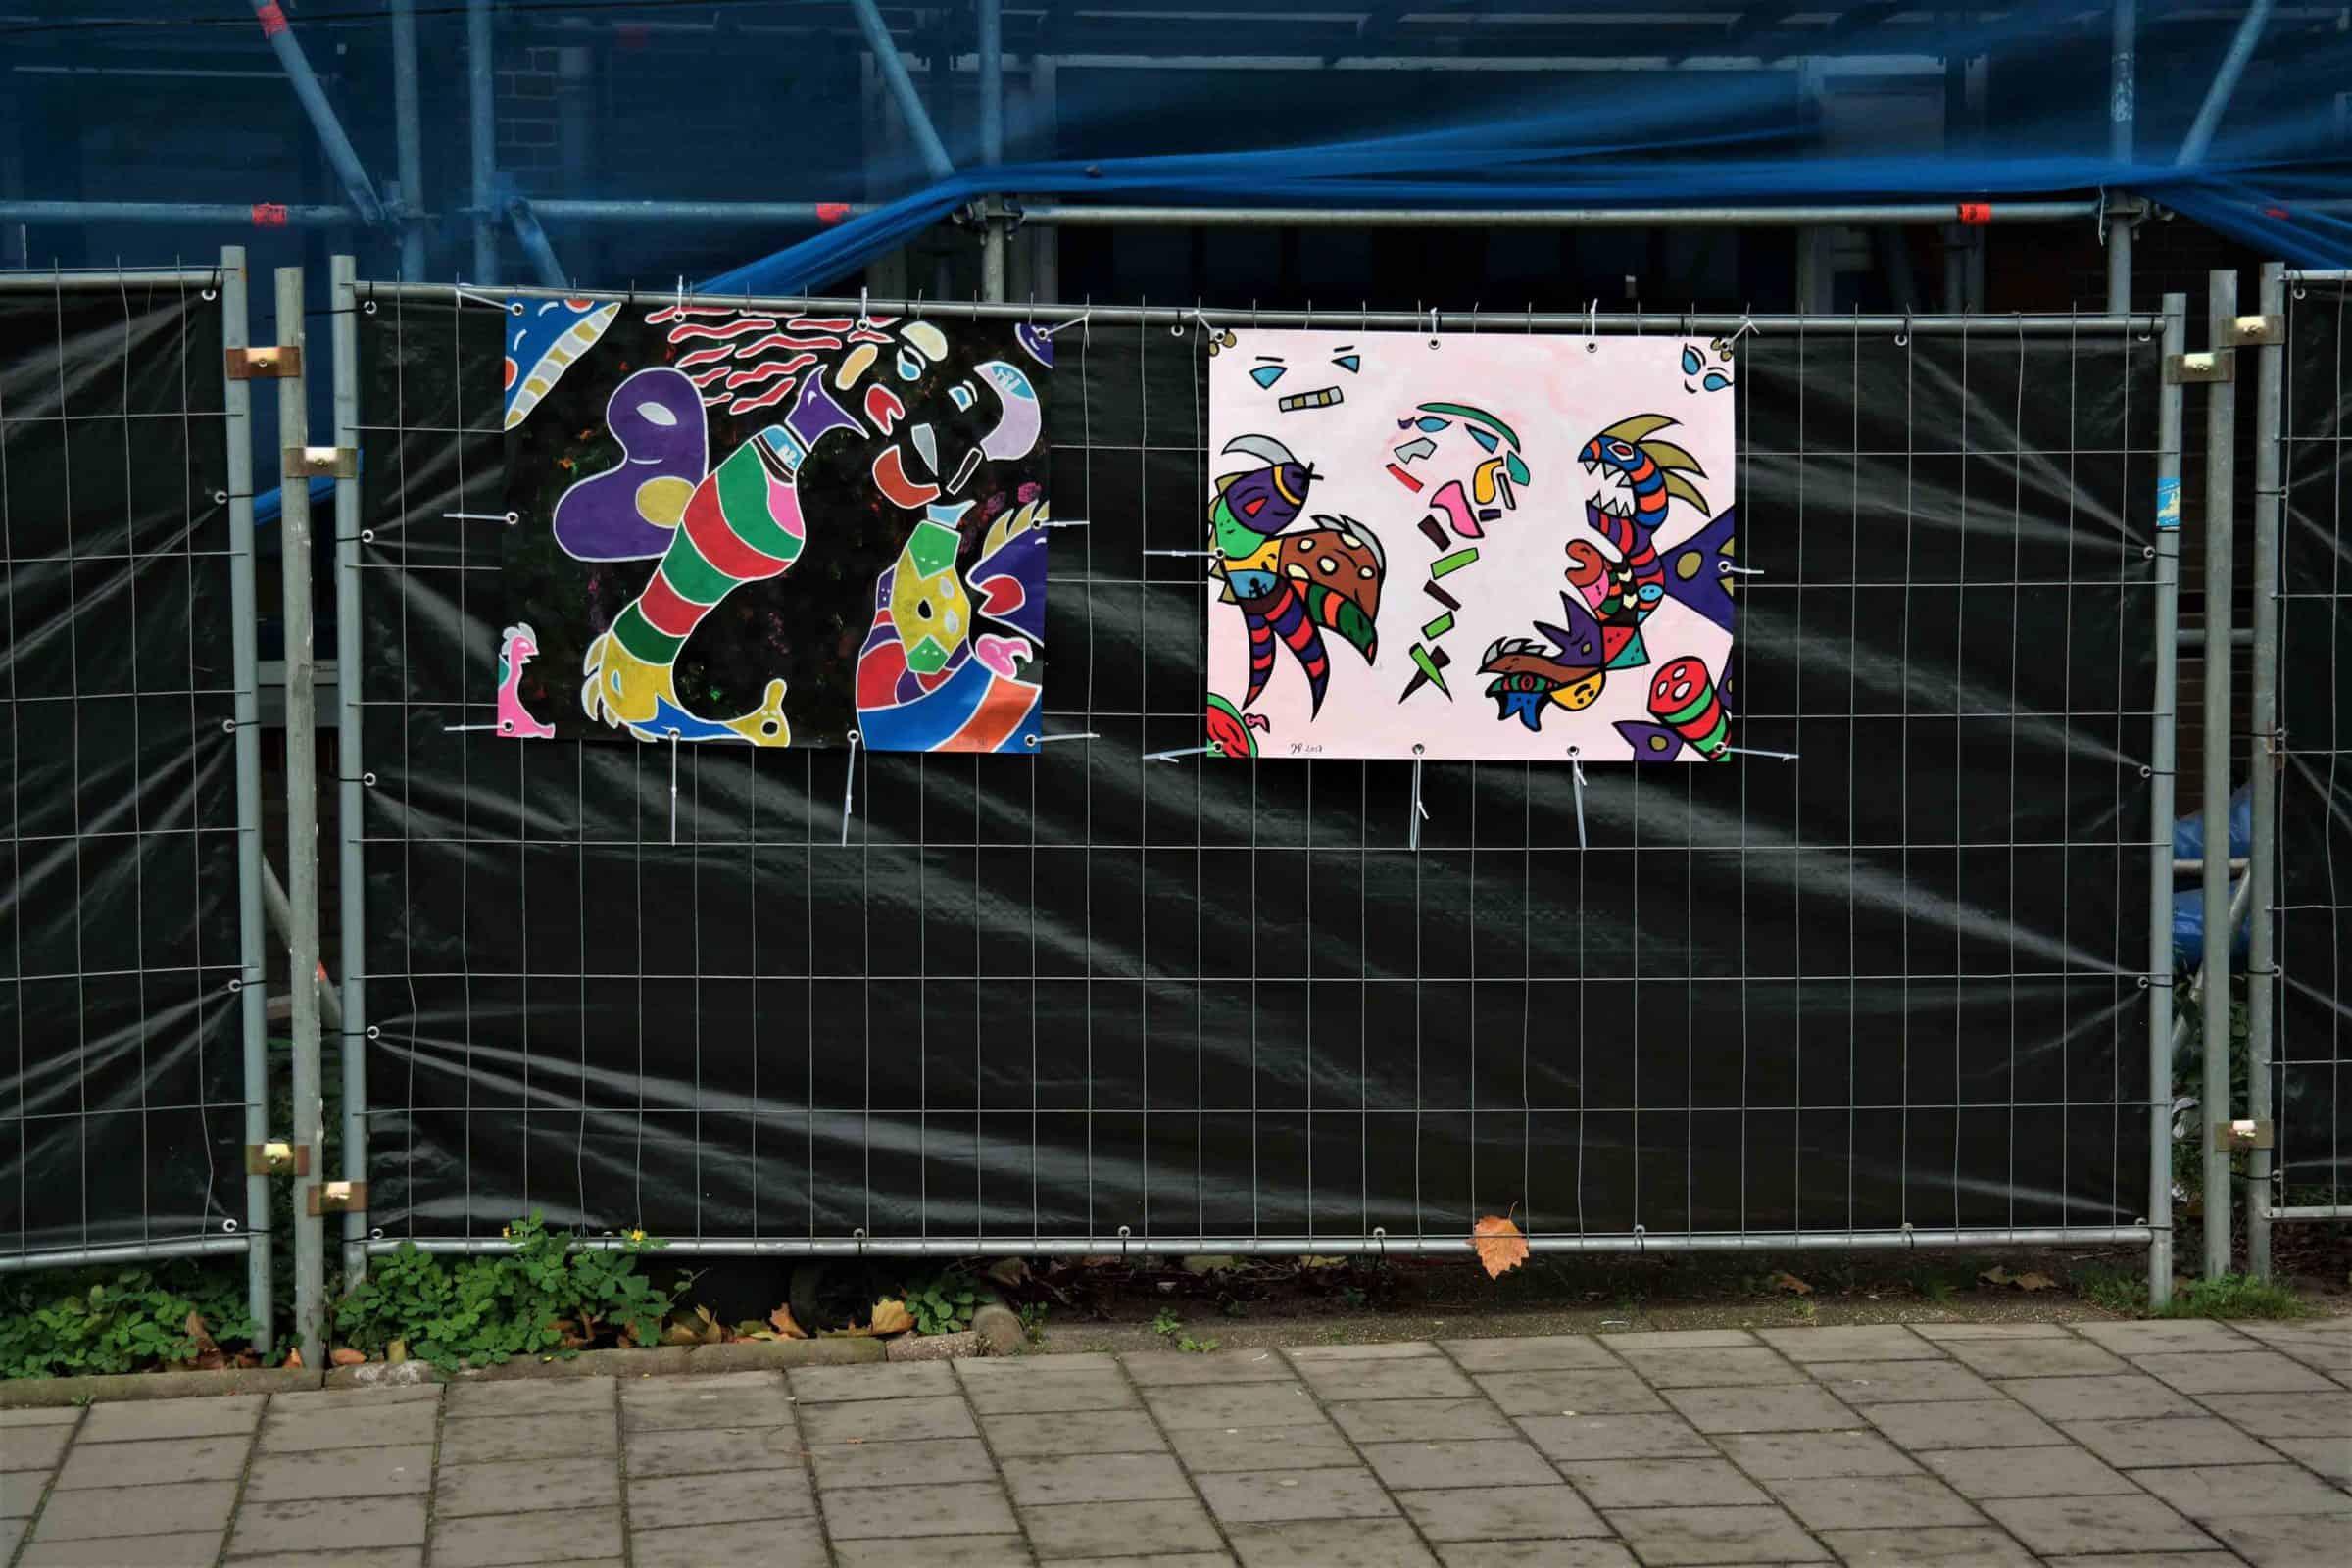 Painting-tyvek-kunstroute-Alphen-aan-den-Rijn-JABOScreations-Jasper-Bos-3-scaled